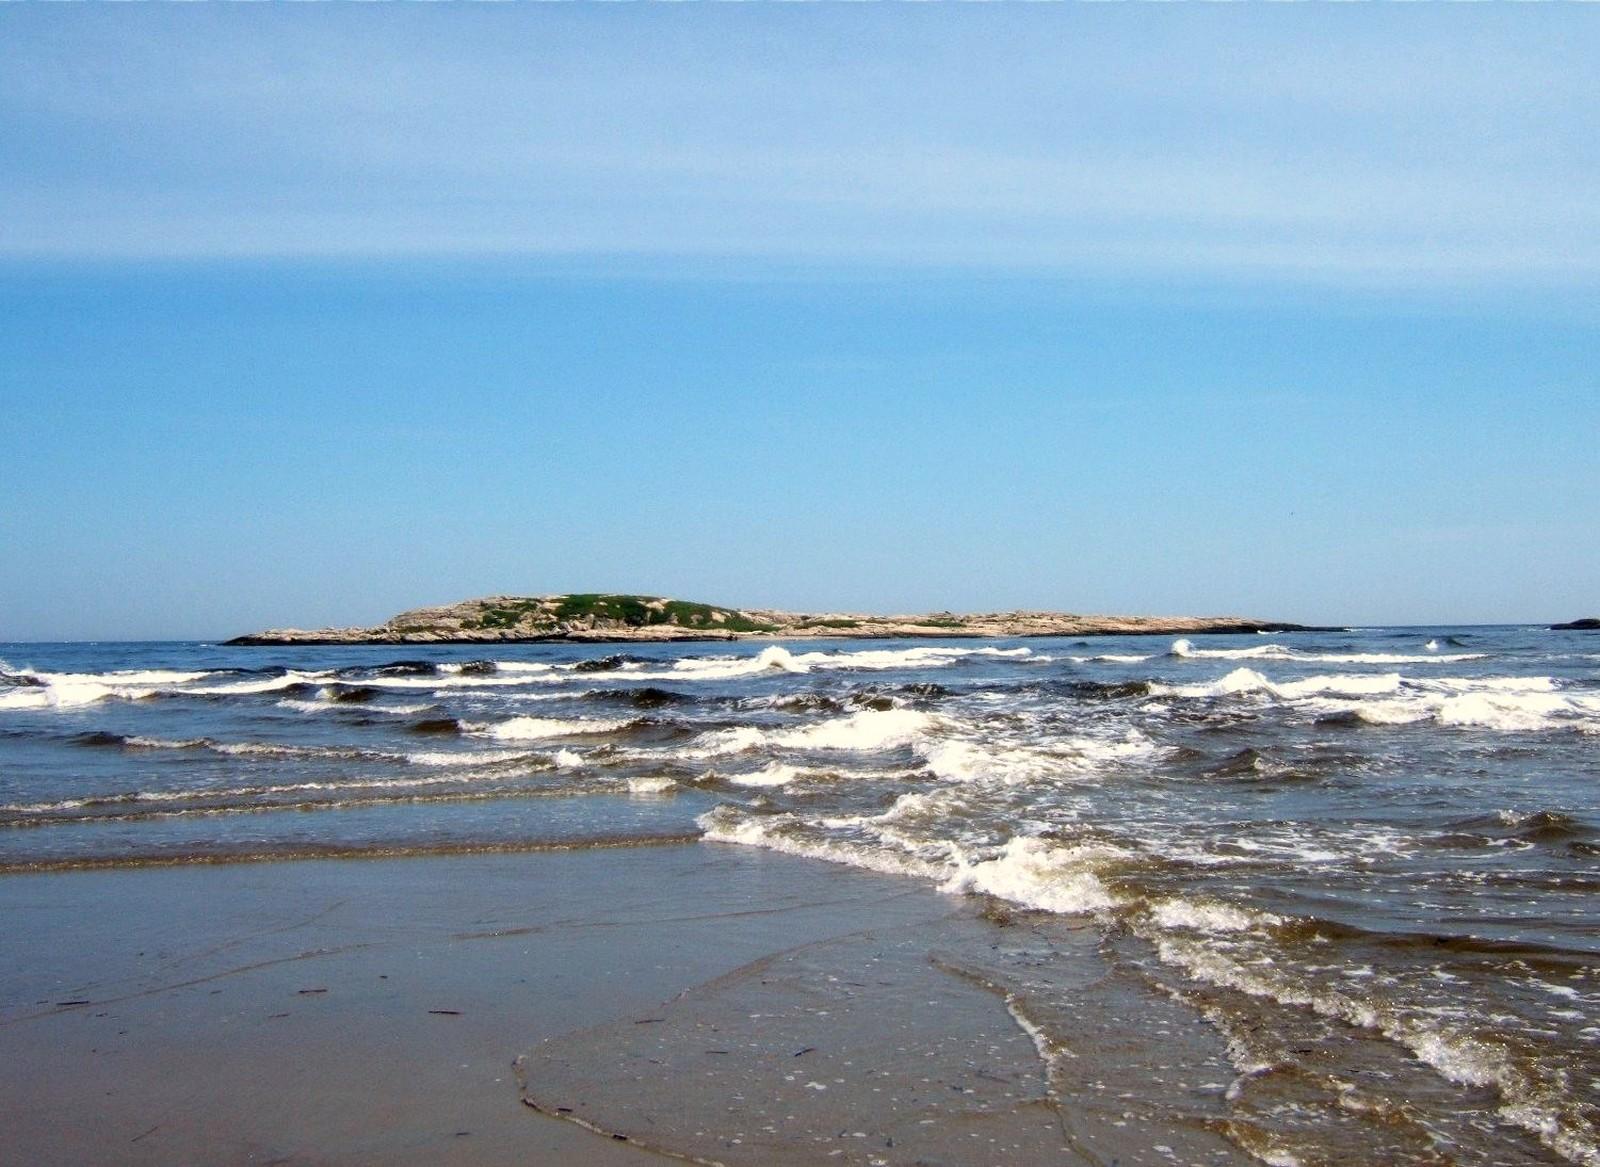 Beach maine pic 4